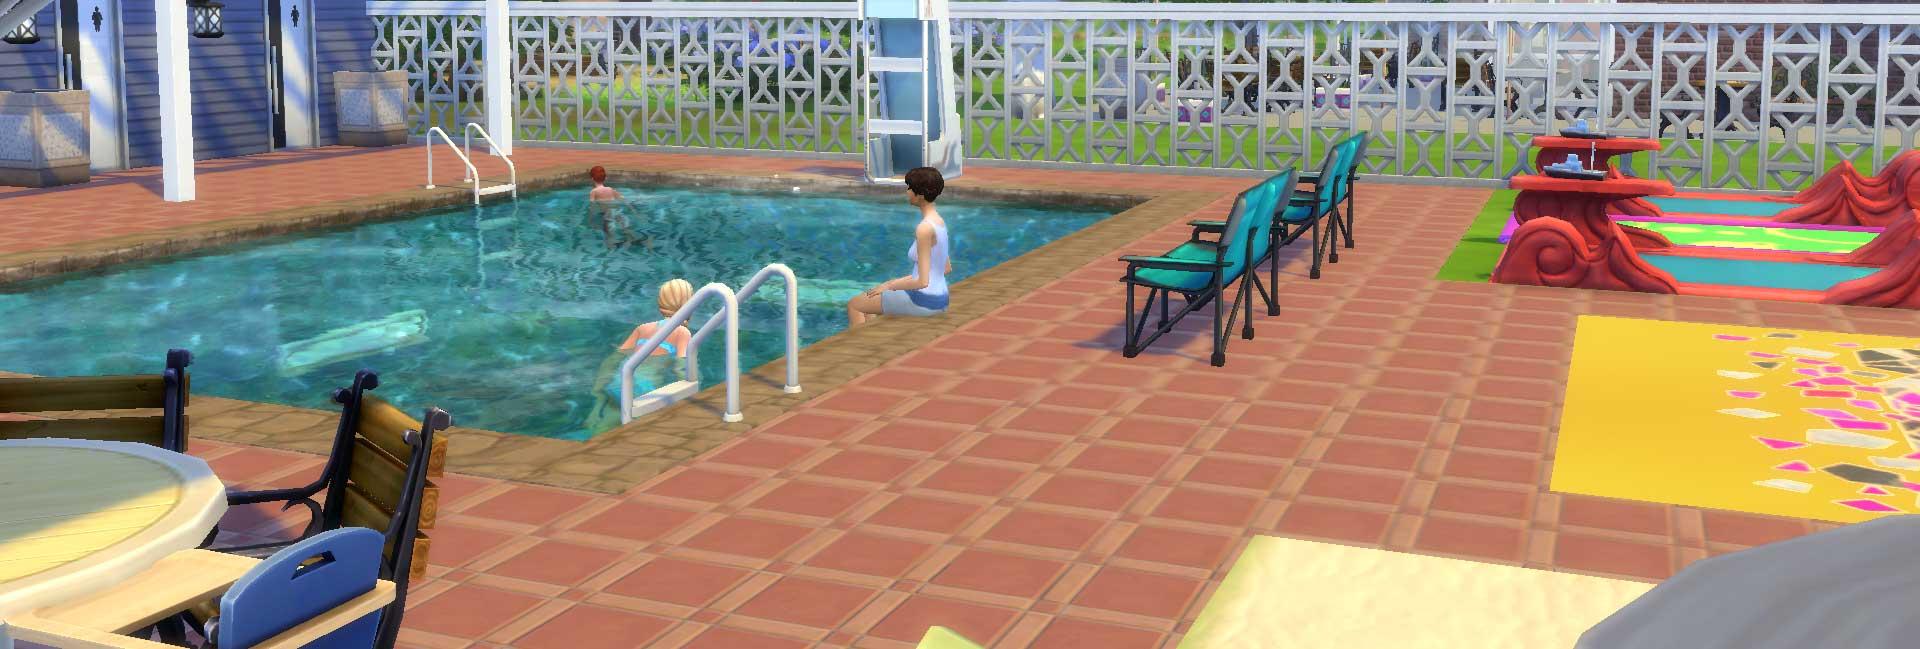 Sims 4 Community Pool - Newcrest | Bri K's Dusky Illusions